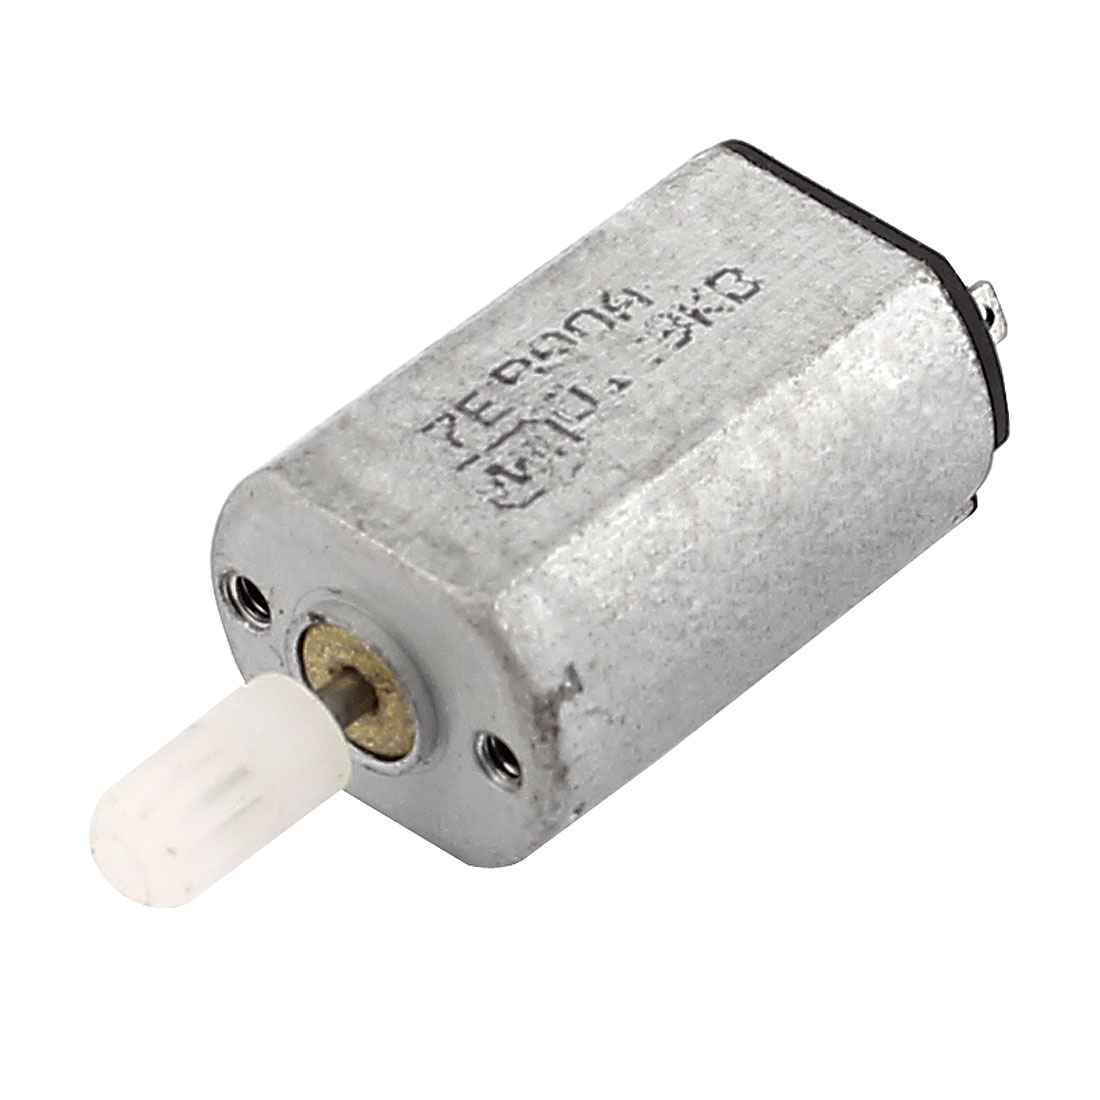 DC 4.5V 22000RPM High Speed Mini Micro Motor for Massager